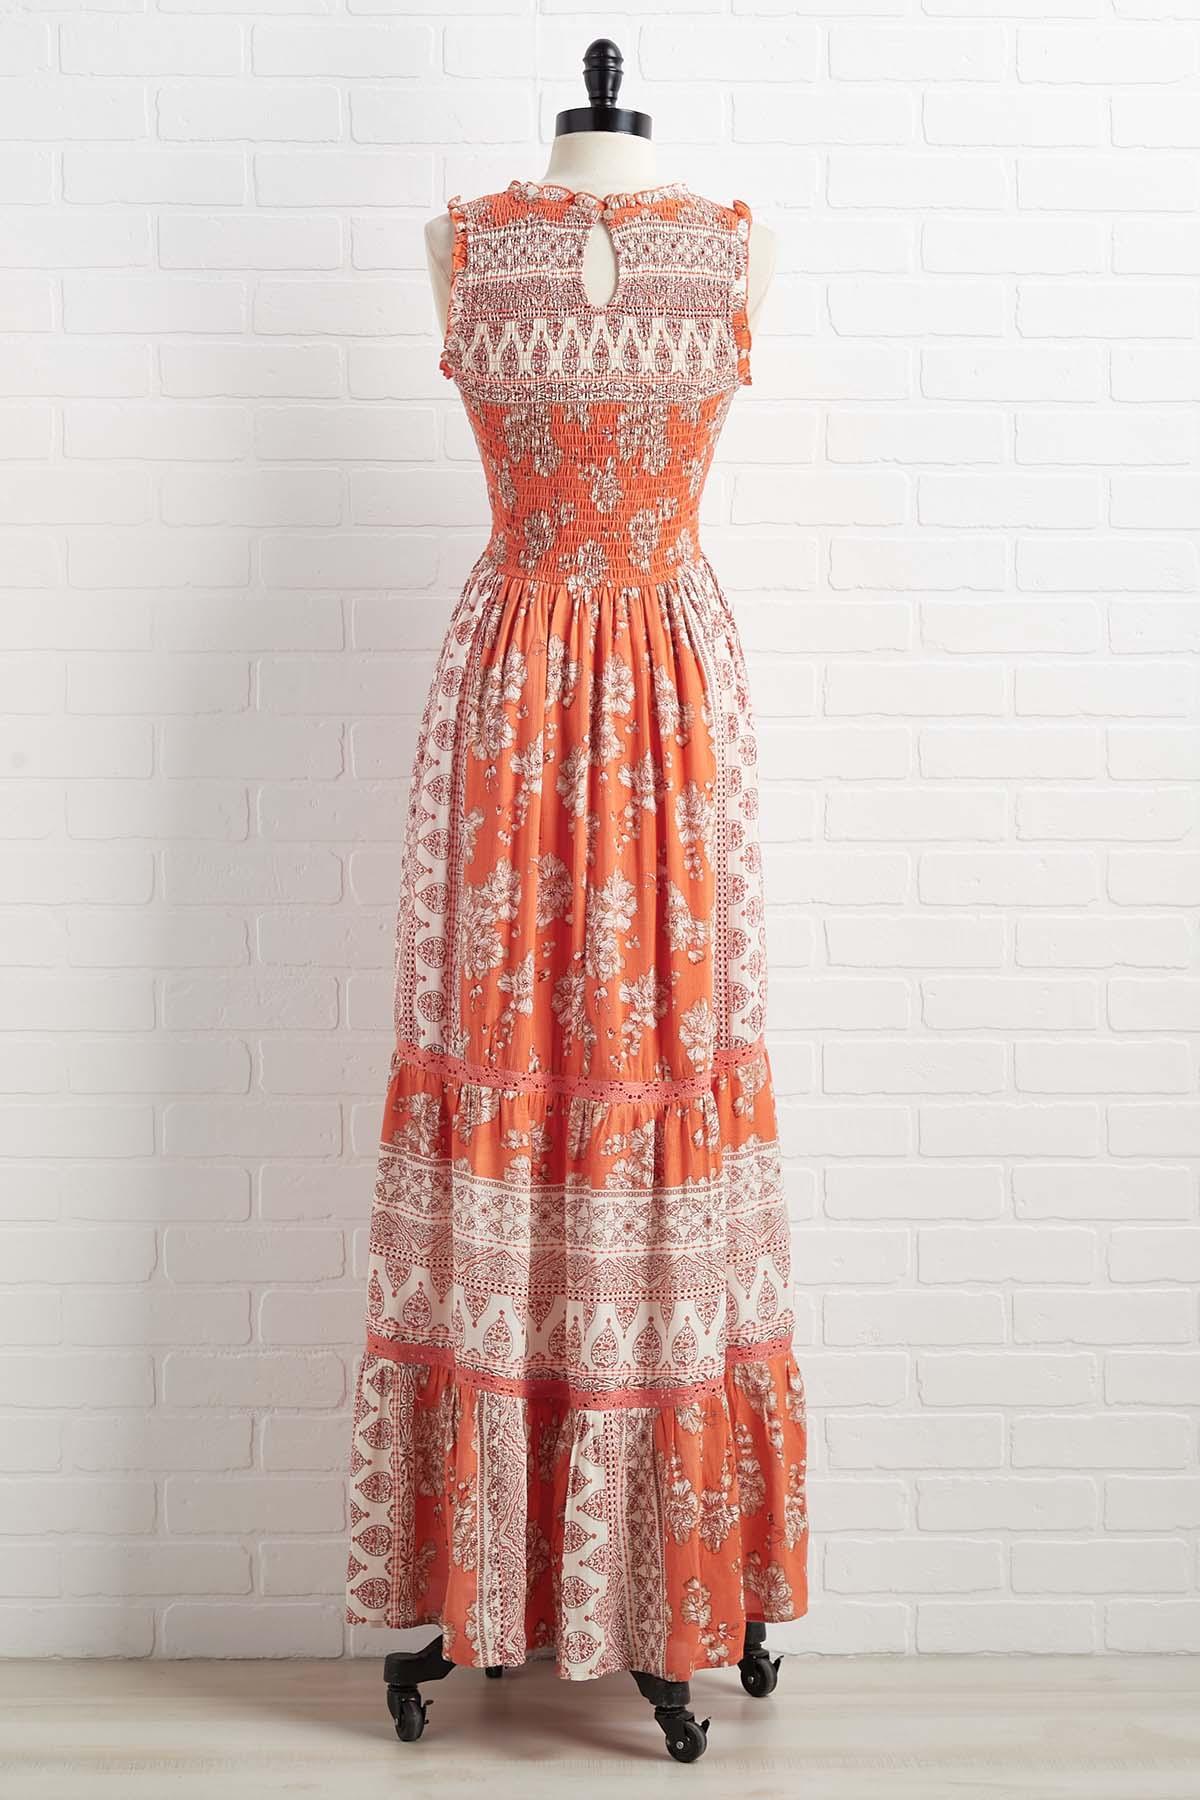 Sweetest Summer Dress